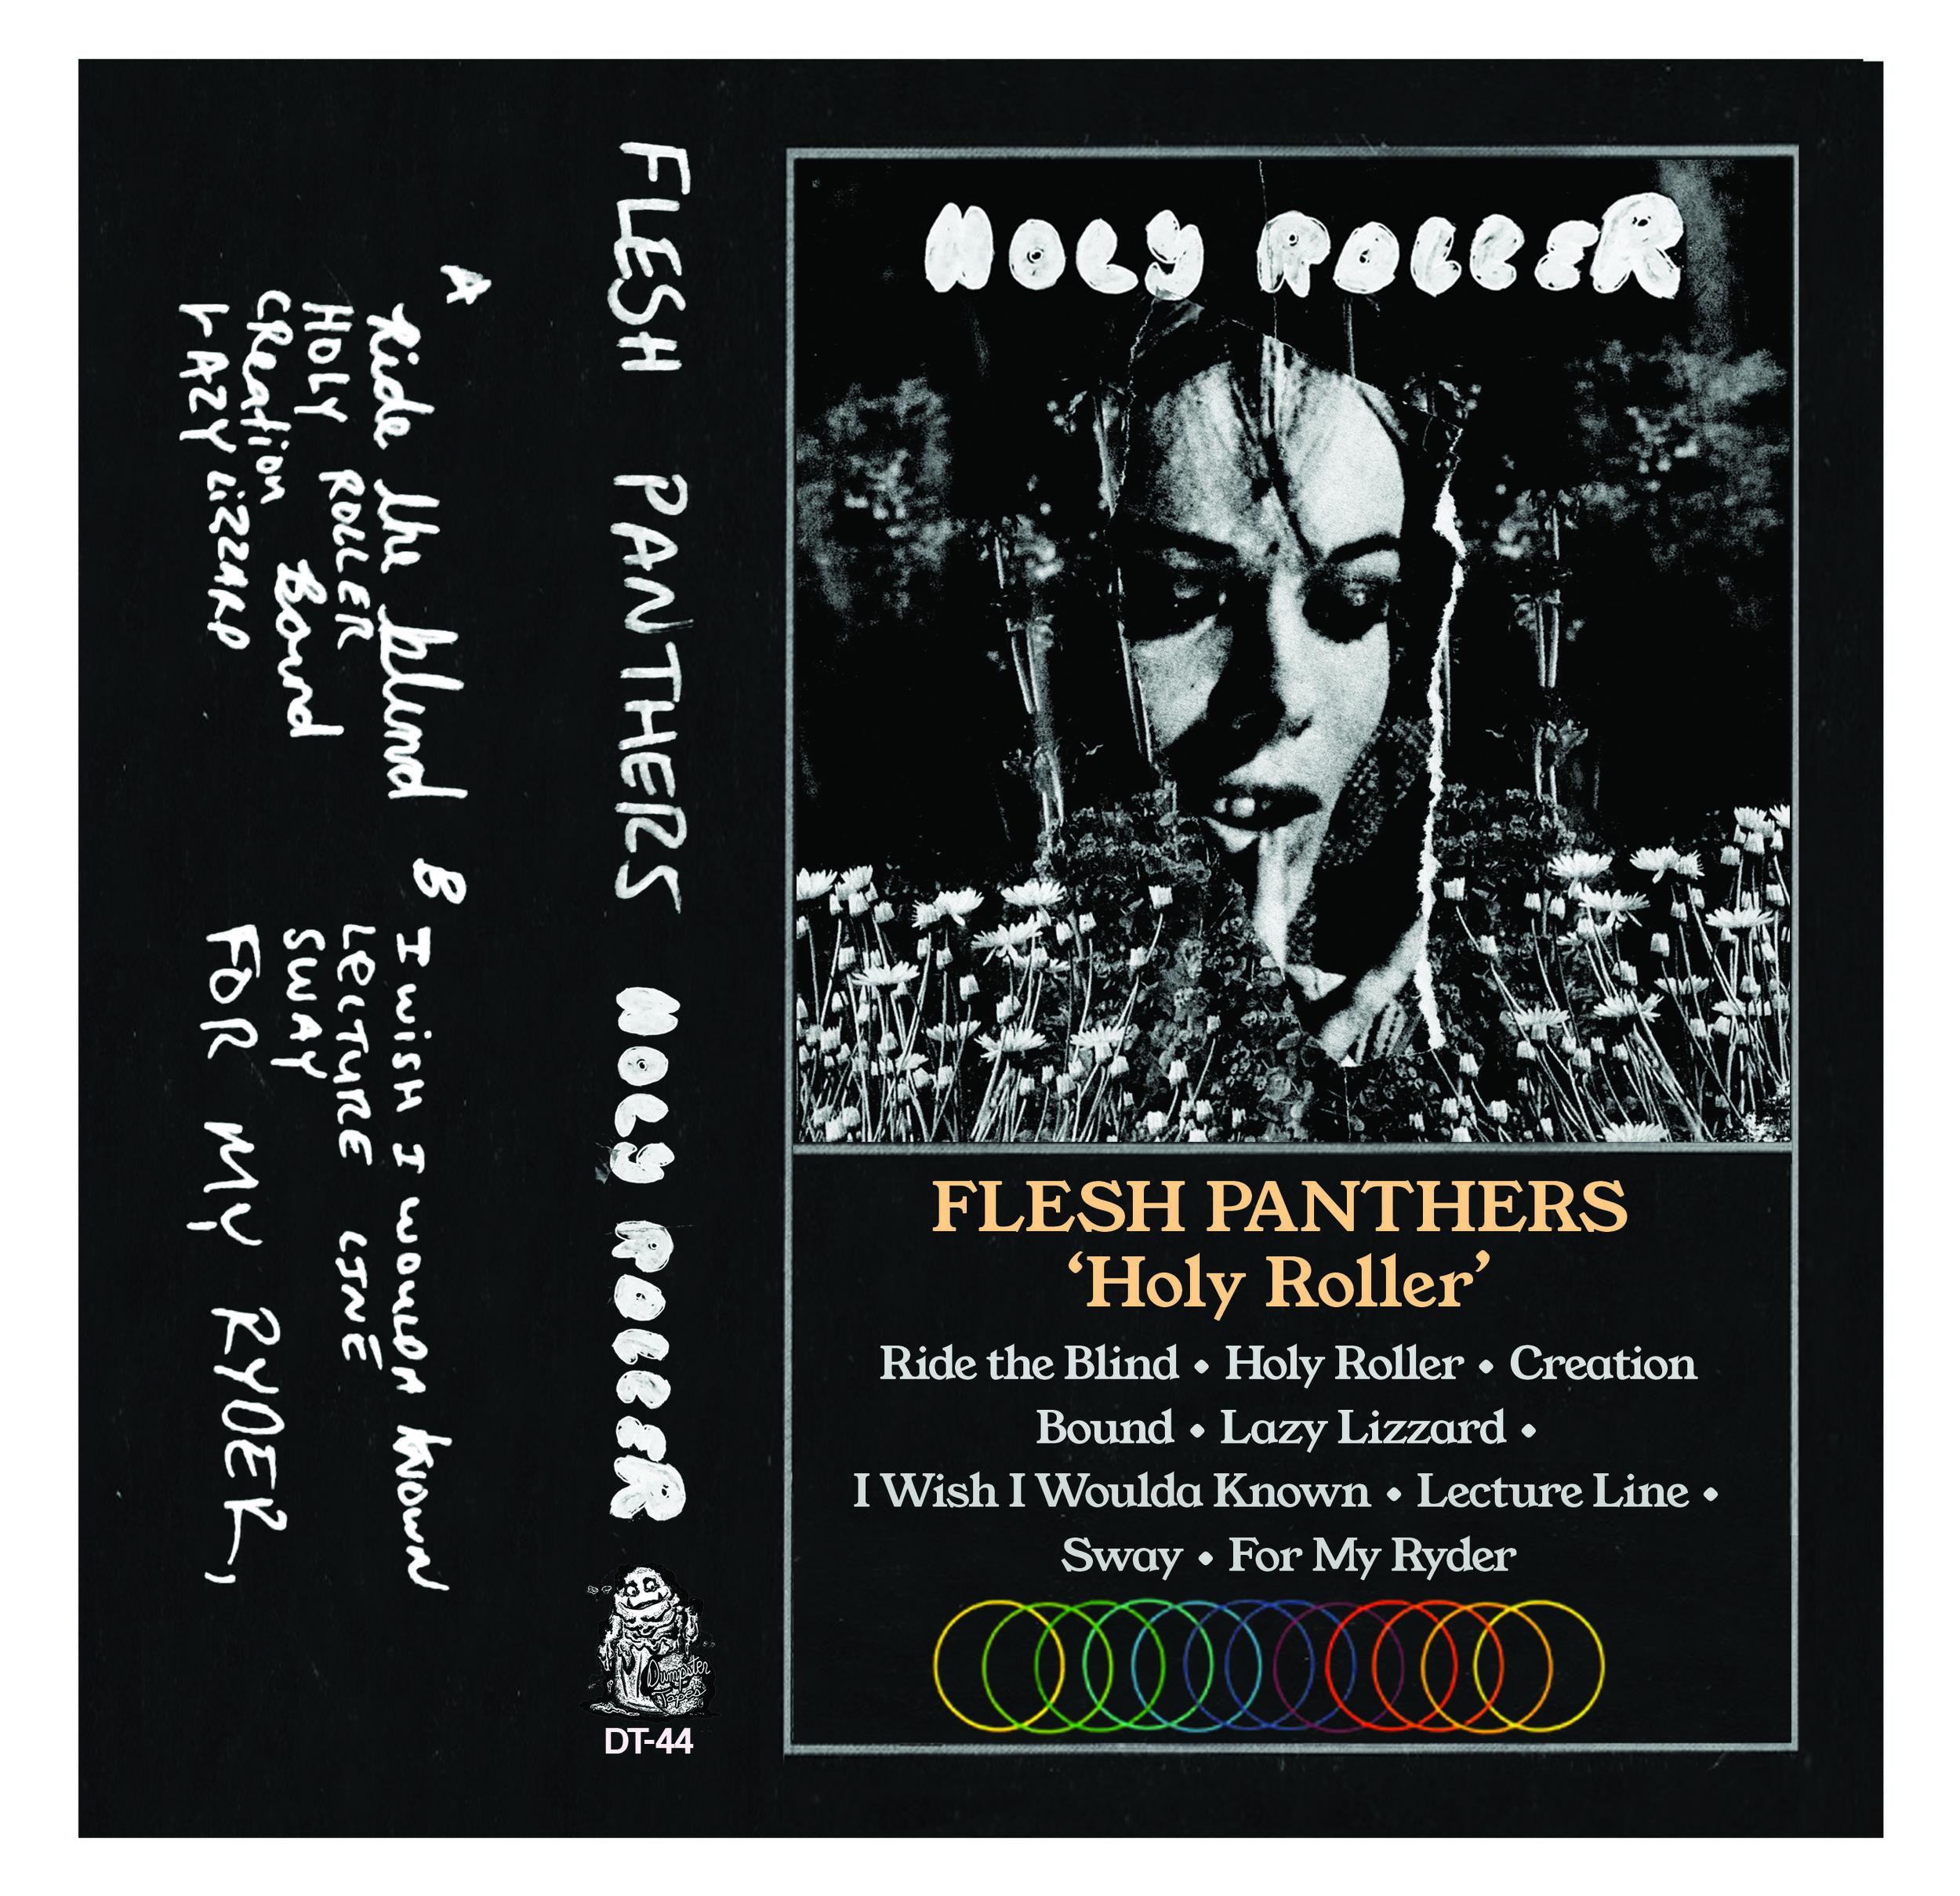 DT44 Flesh Panthers jcard.jpg